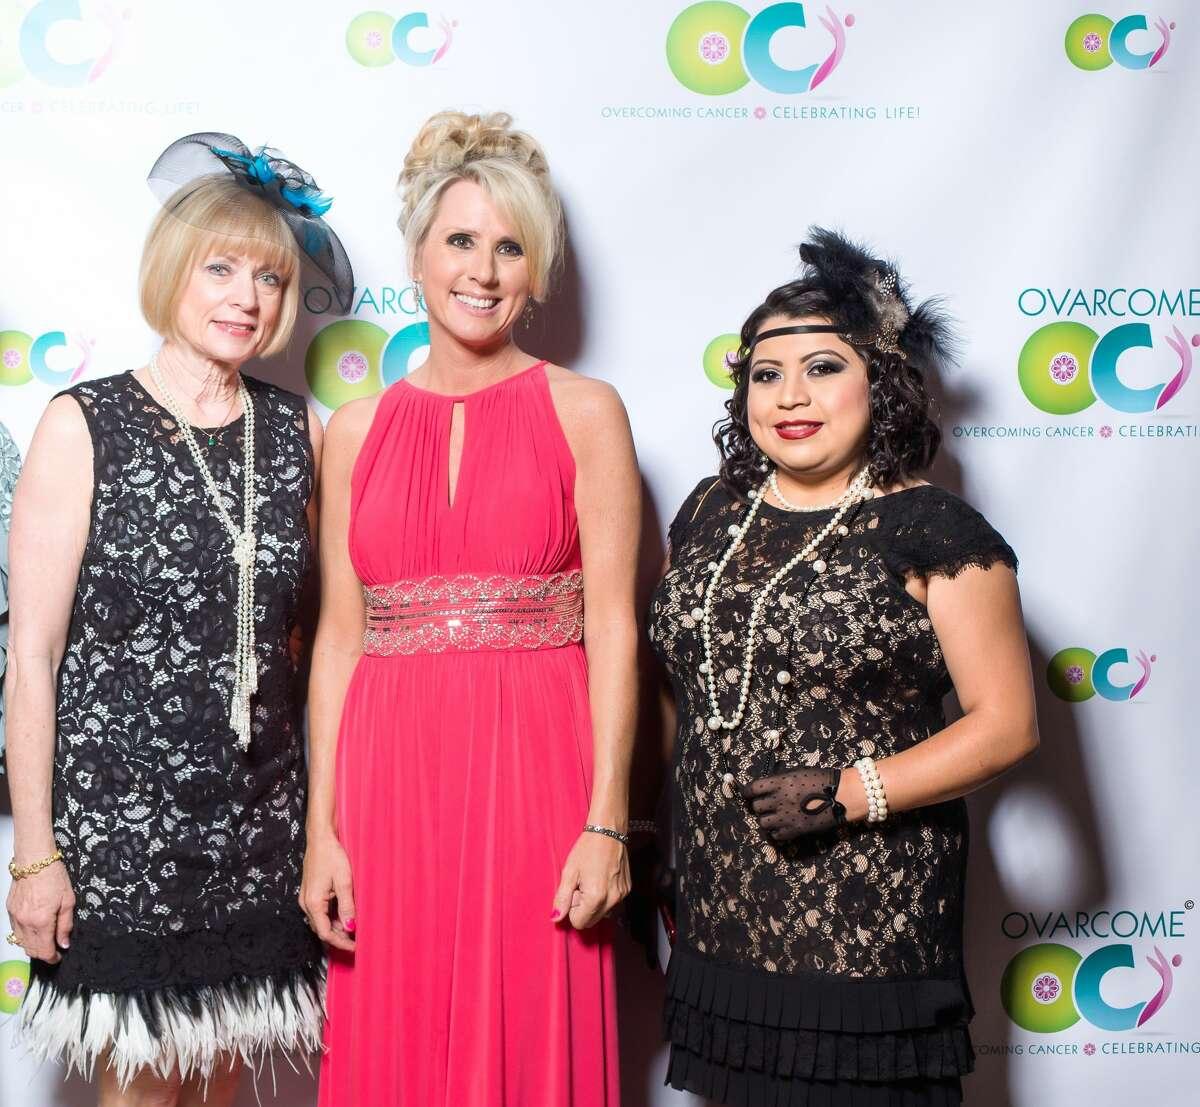 Liz Stegall, Karen Shayne, and Nancy Hernandez